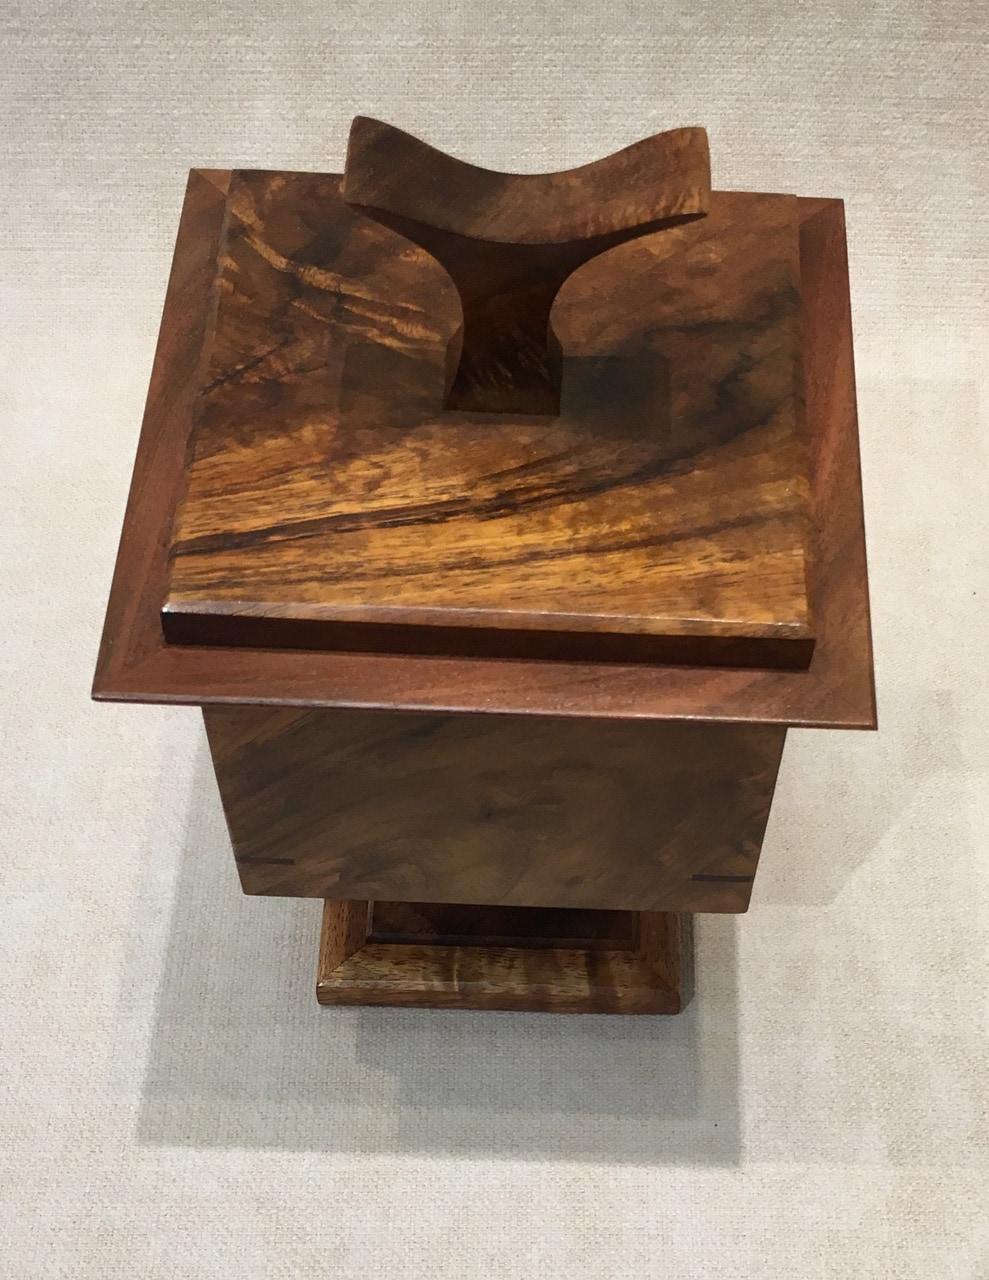 Square Pedestal Box - Top